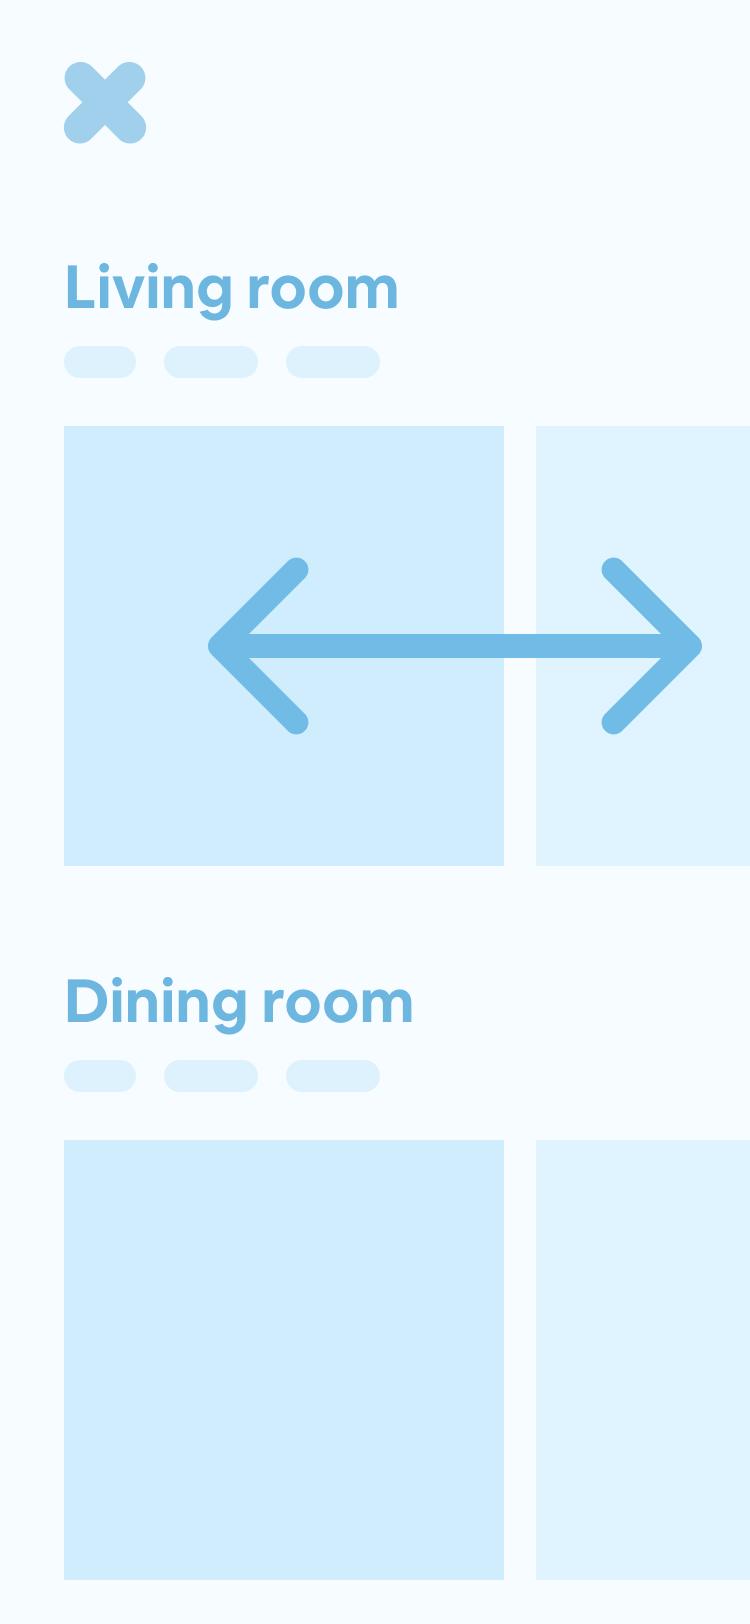 Horizontal rows